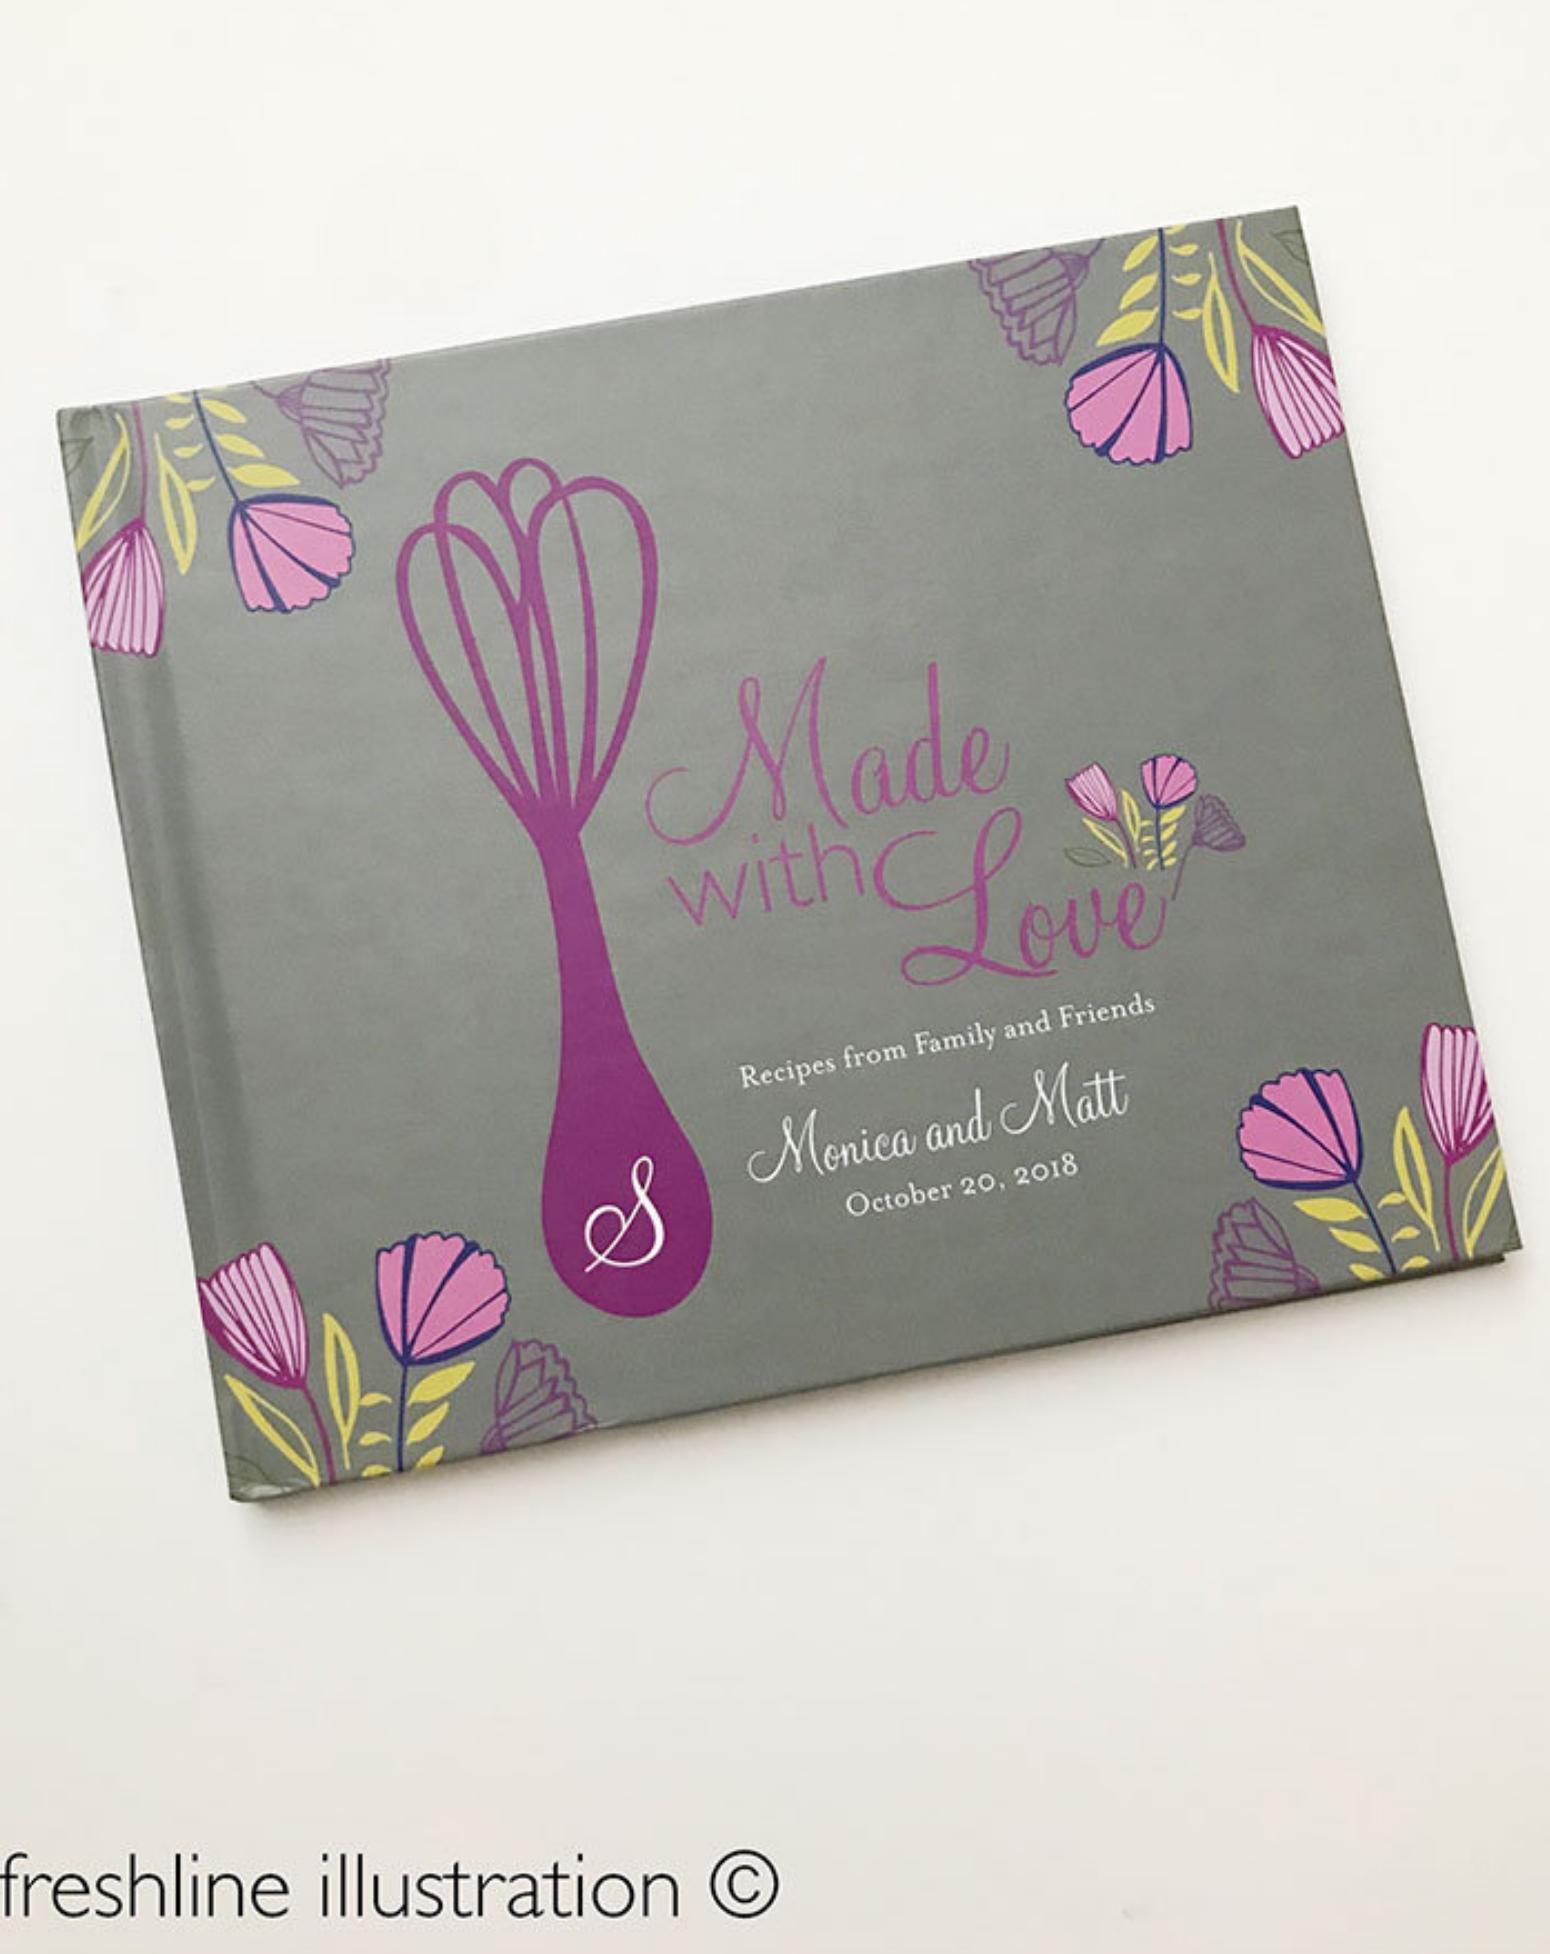 Bridal Shower Recipe Book Bridal Shower Gift For Bride Products Bridal Shower Recipe Book Bridal Shower Gifts For Bride Bridal Shower Gifts